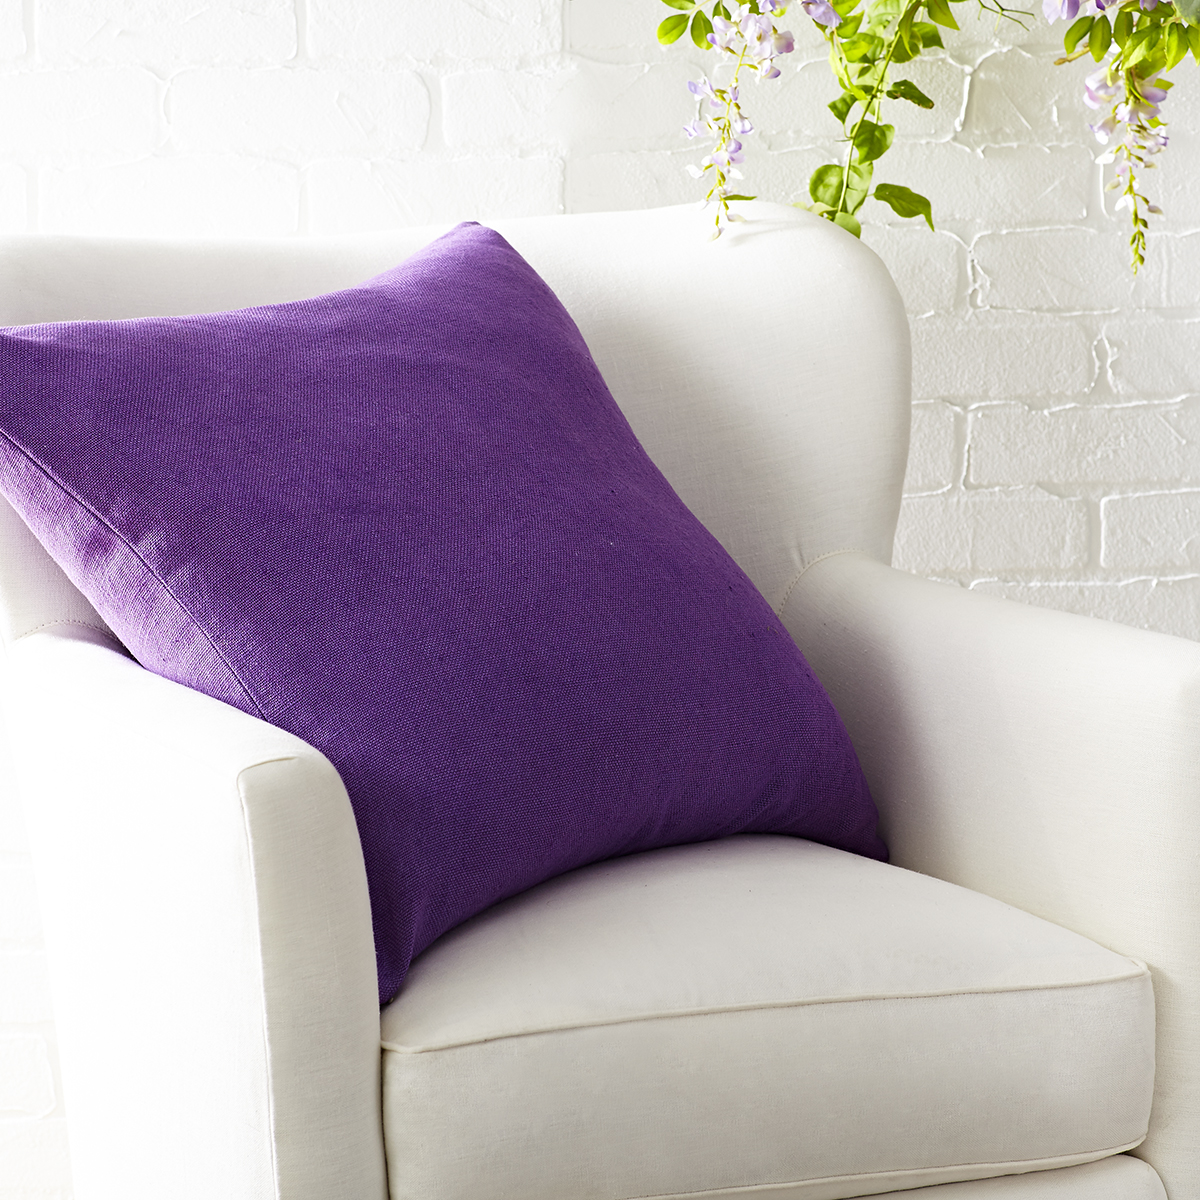 European Flax Linen Pillow Cover – Wisteria Square